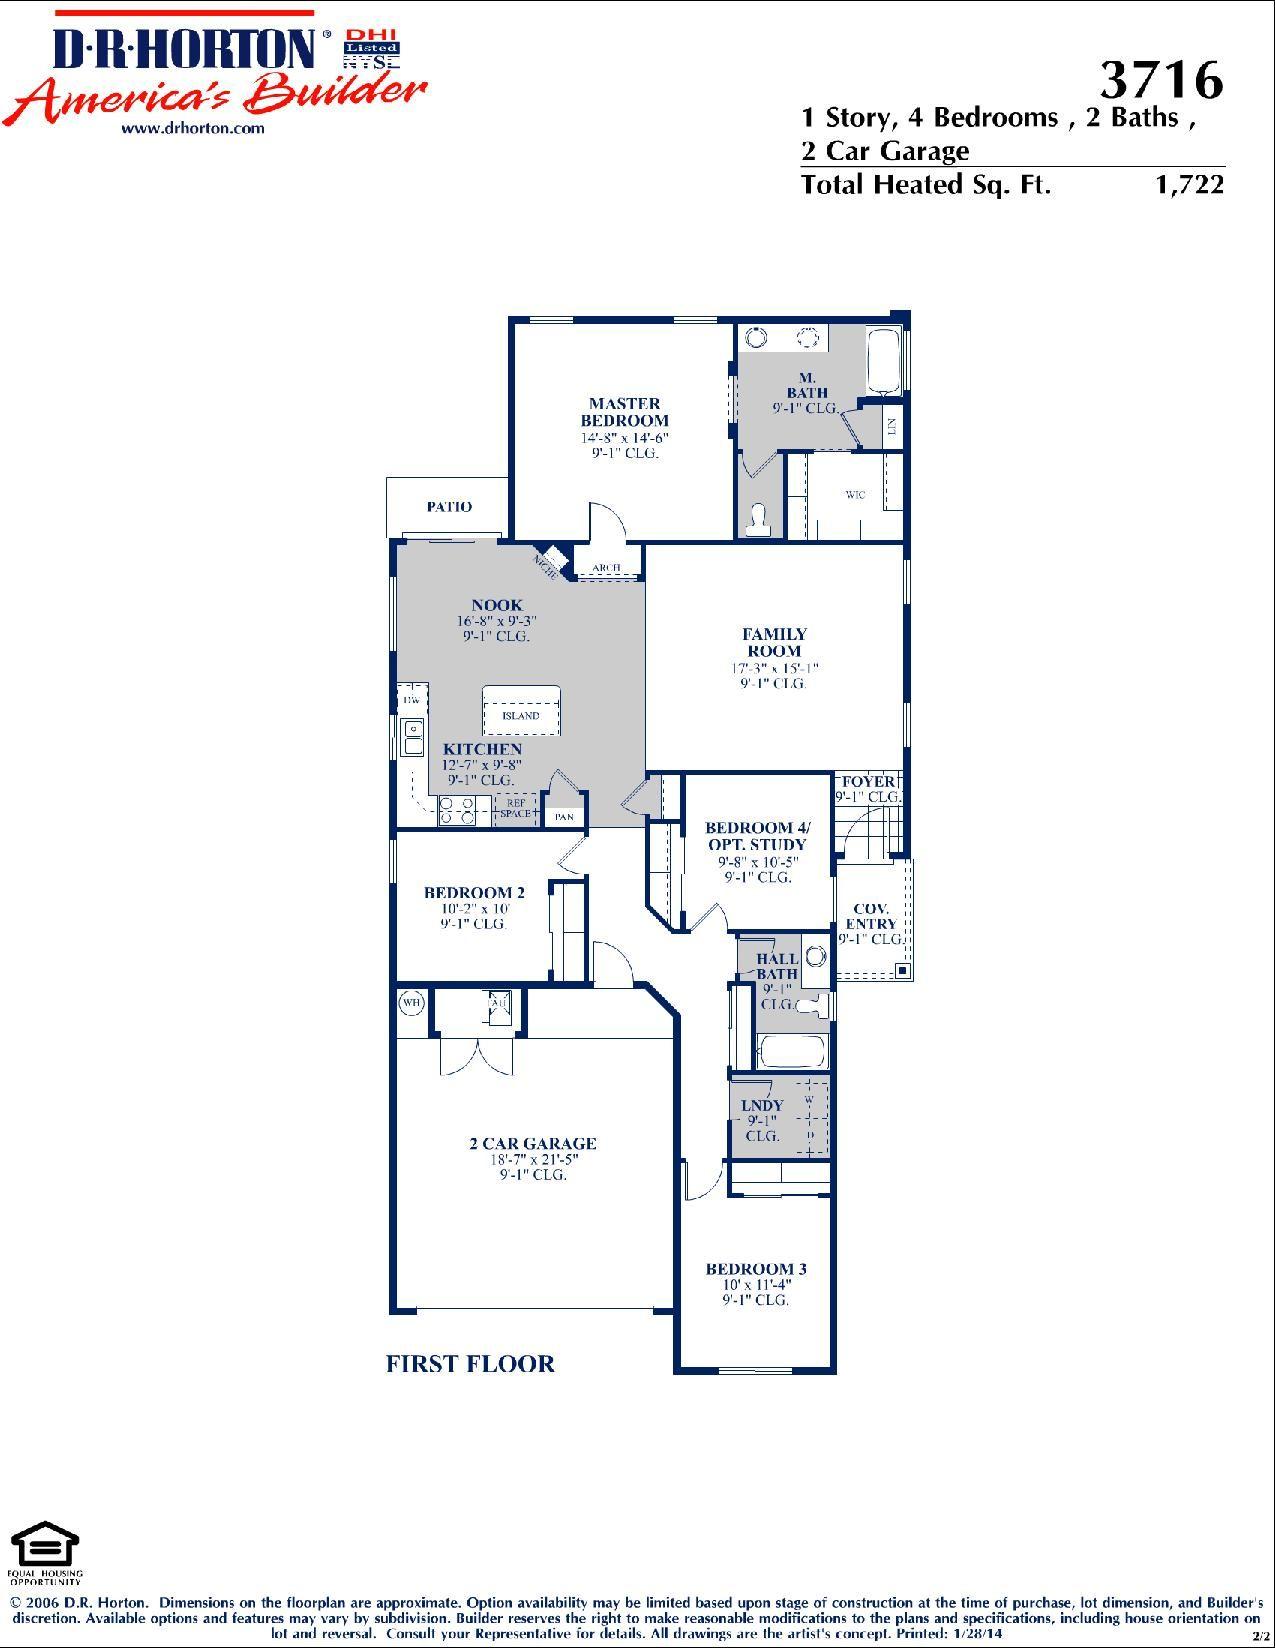 DR Horton Sandoval Floor Plan via wwwnmhometeamcom DR Horton